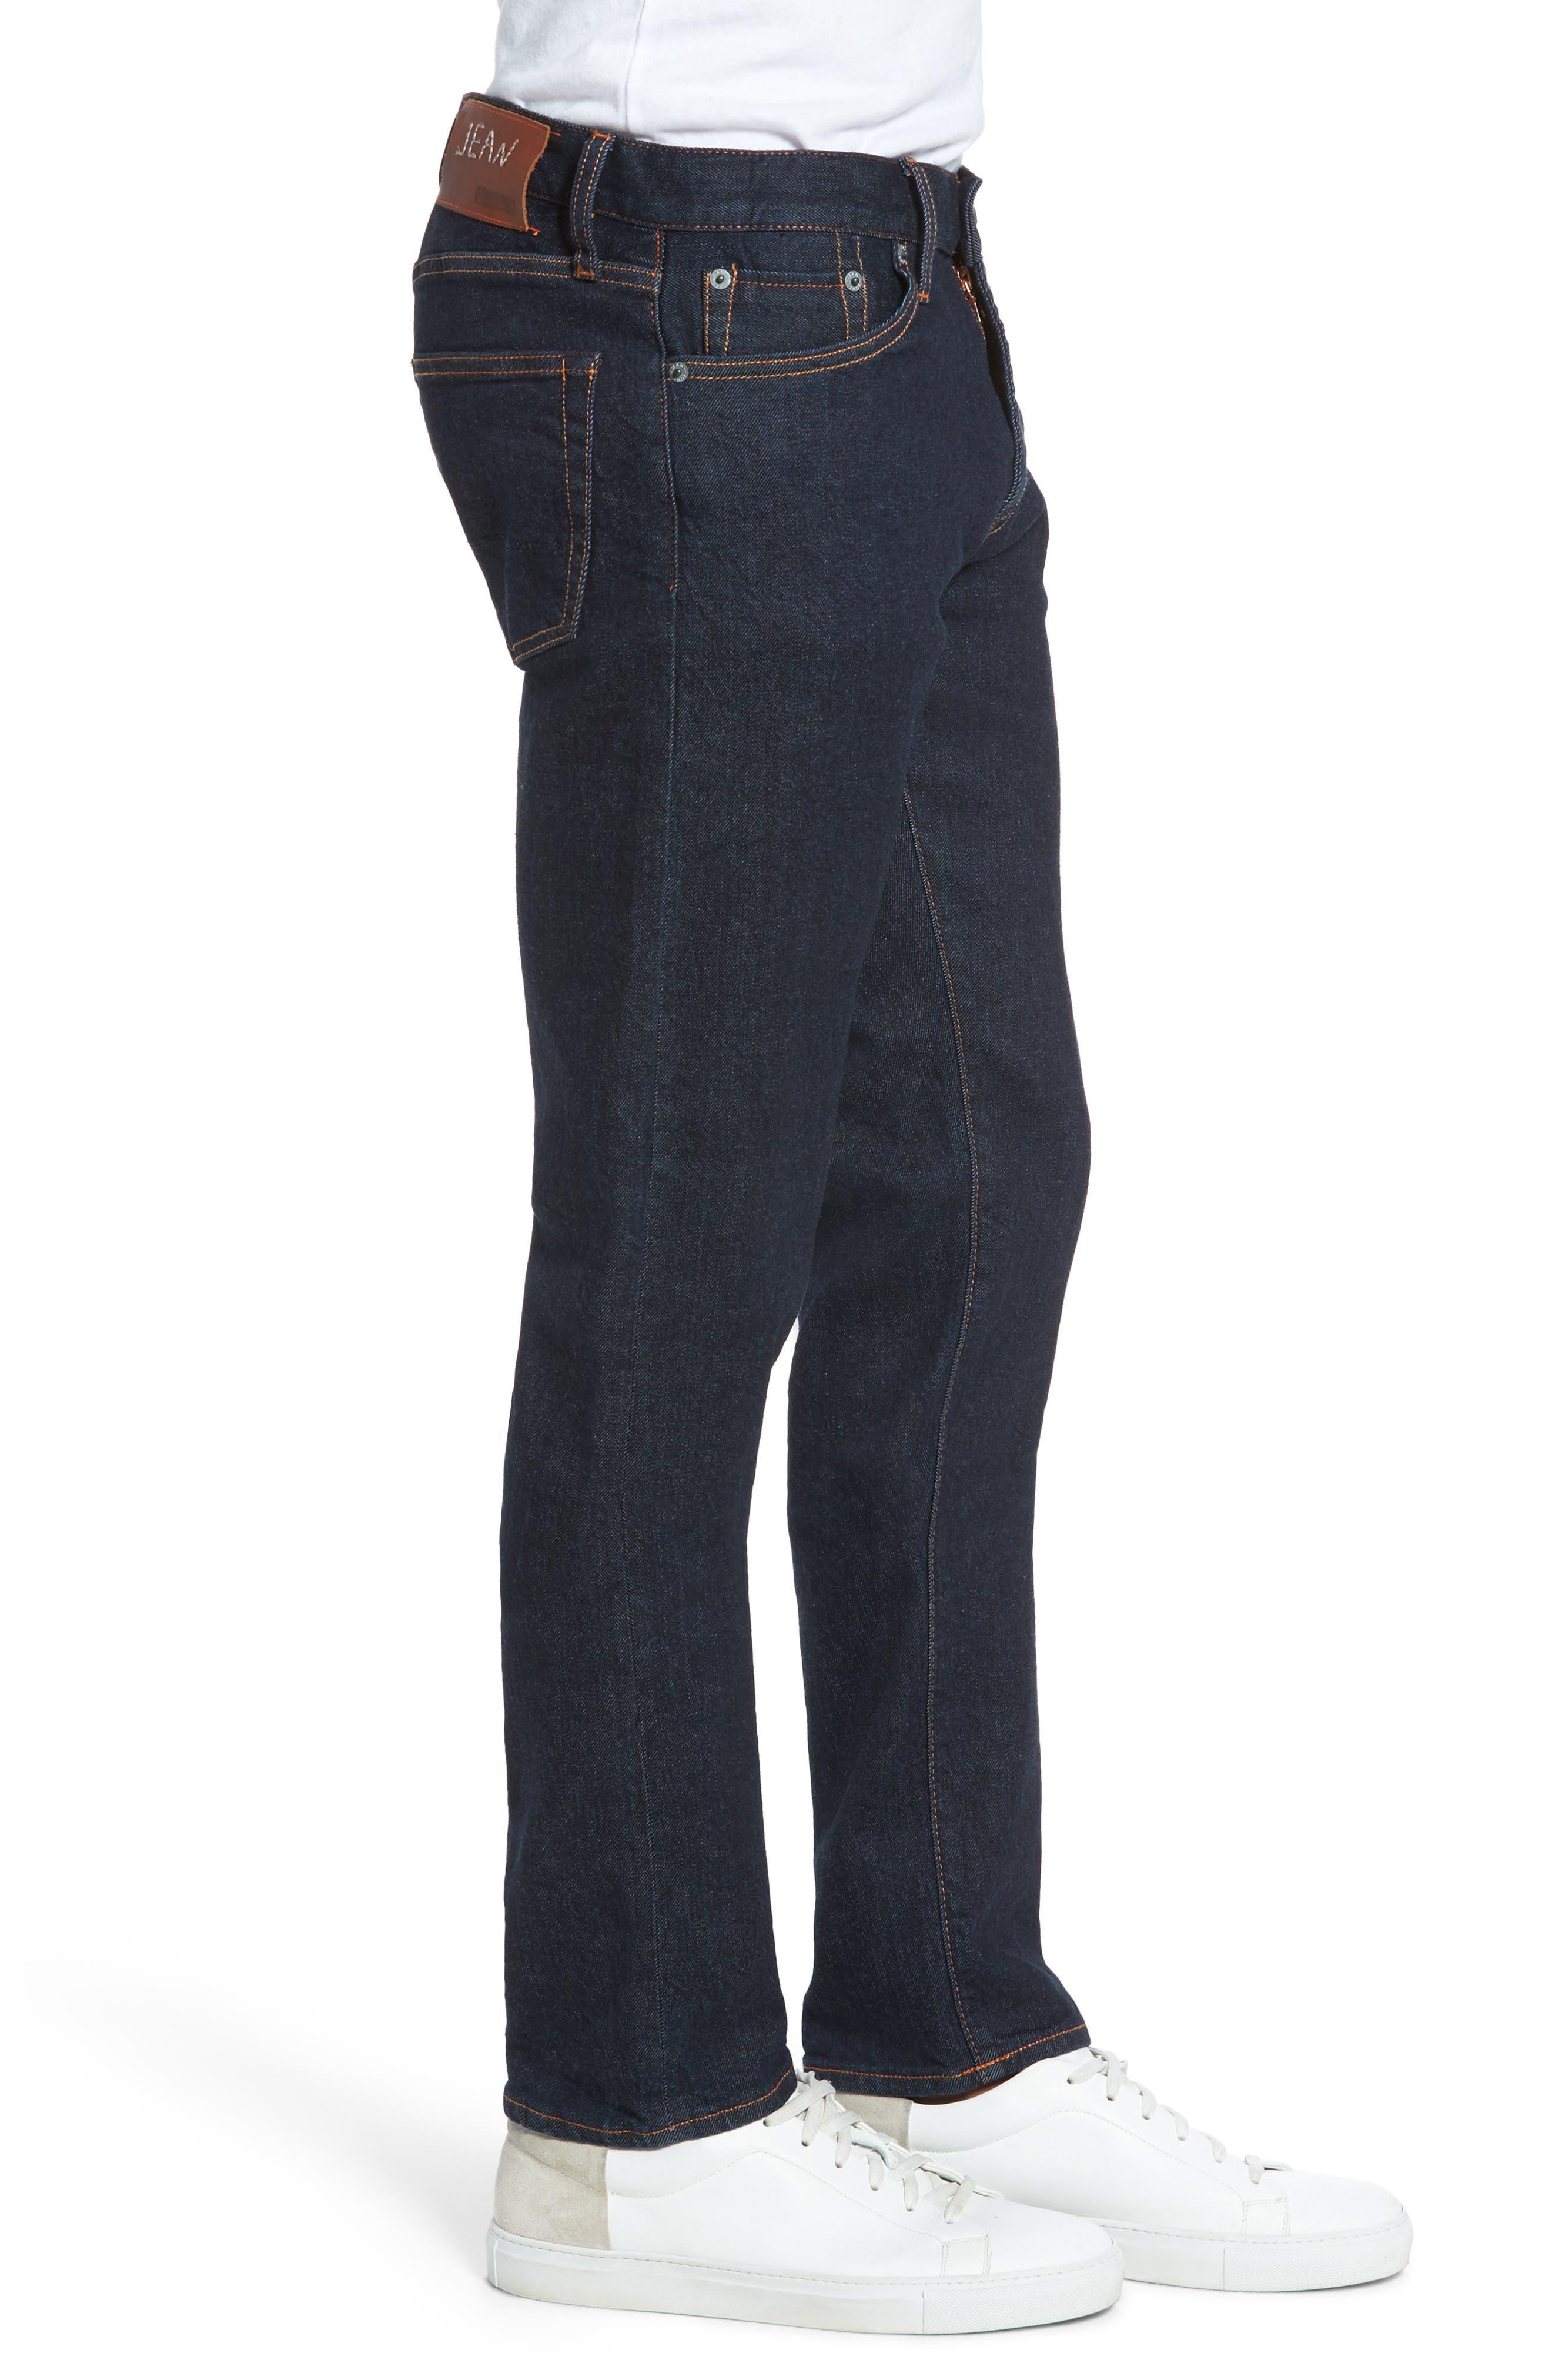 Jim Slim Fit Selvedge Jeans,                             Alternate thumbnail 3, color,                             460